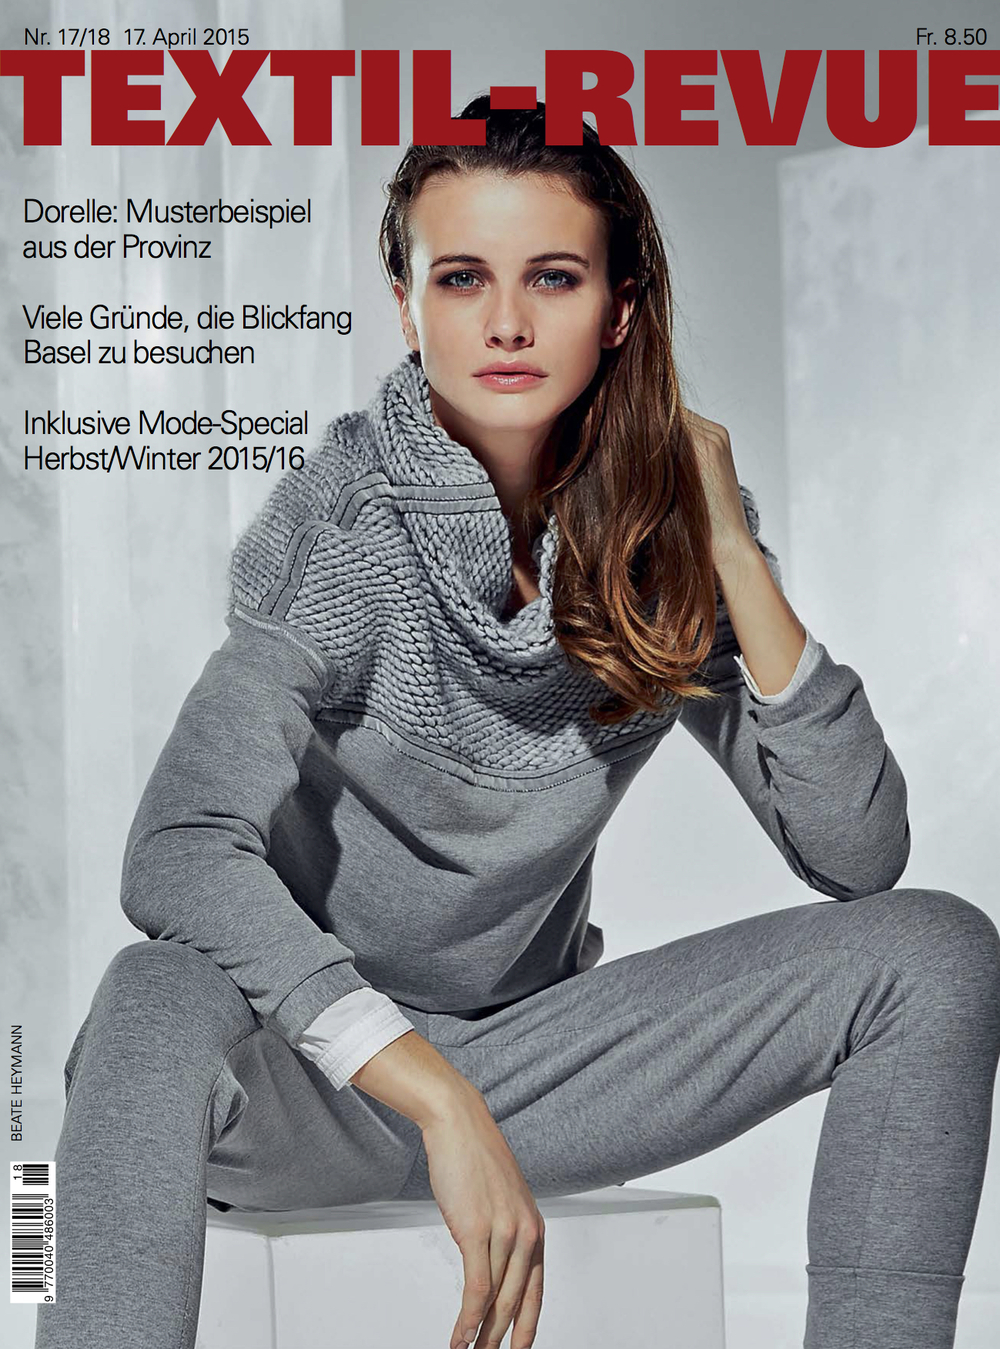 Textil Revue 17_Cover.jpg